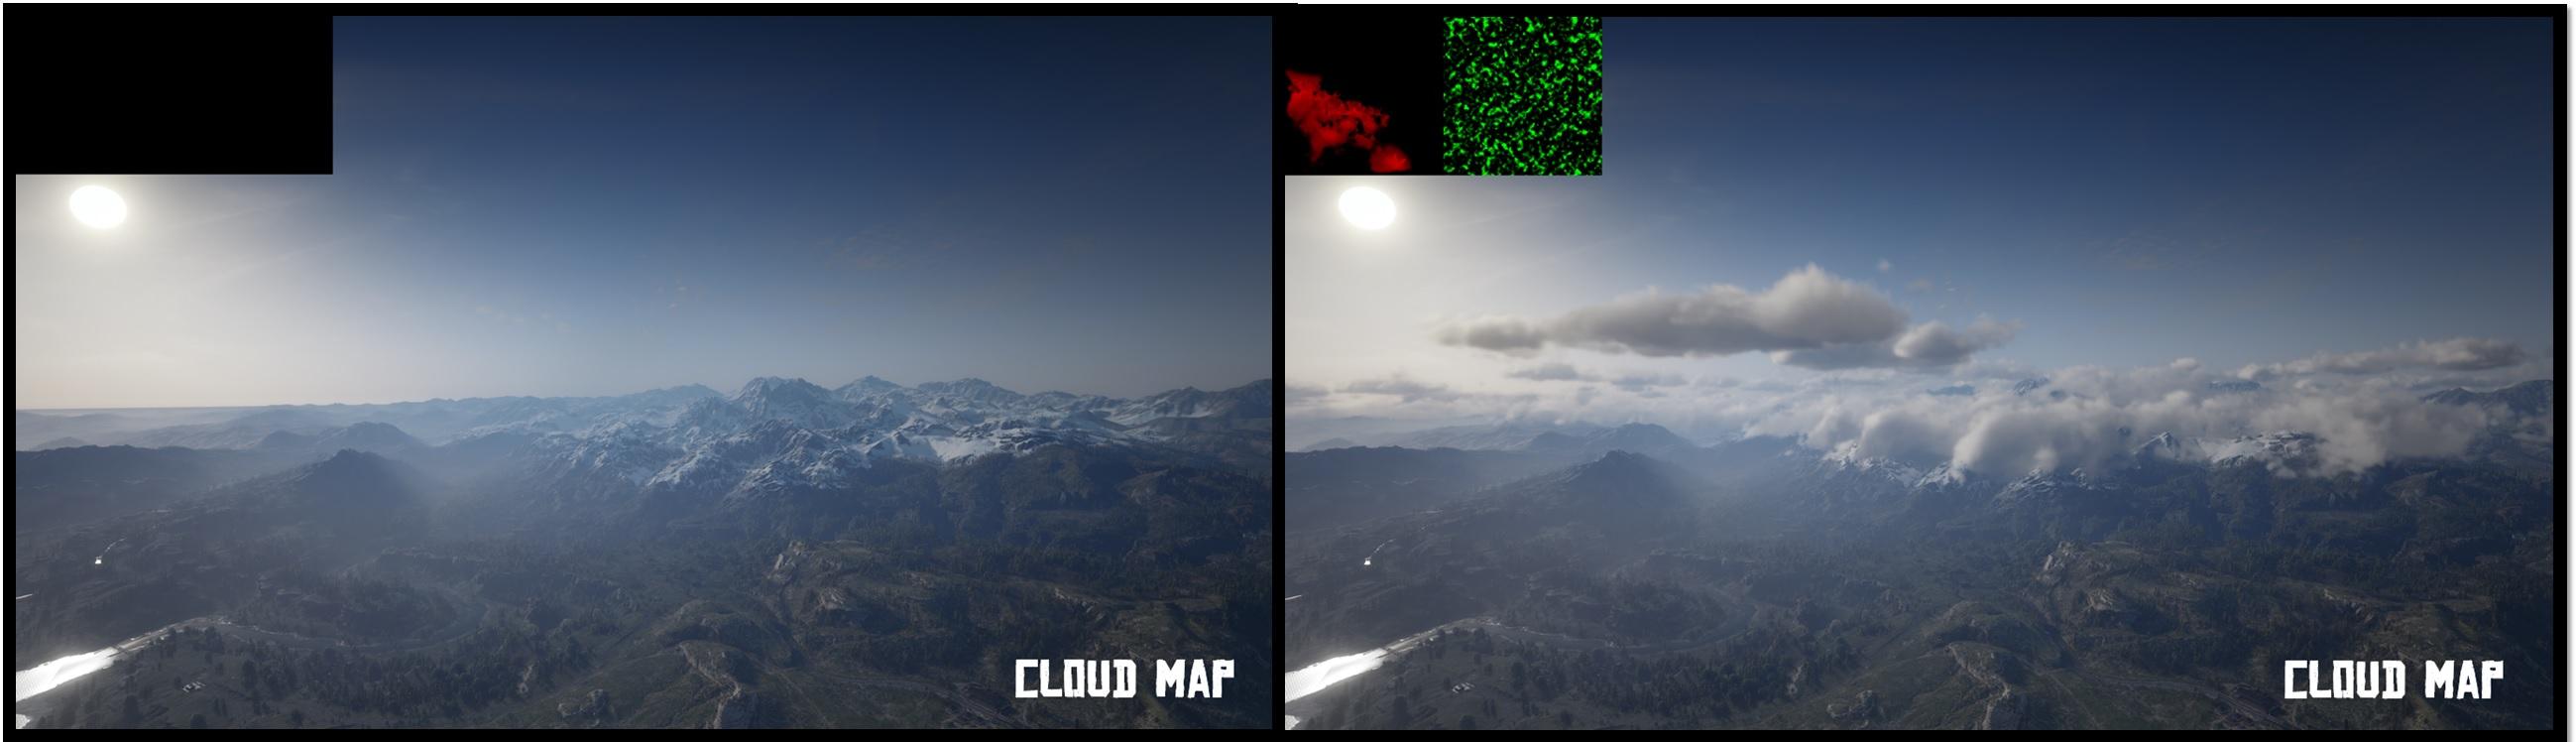 Cloud Map